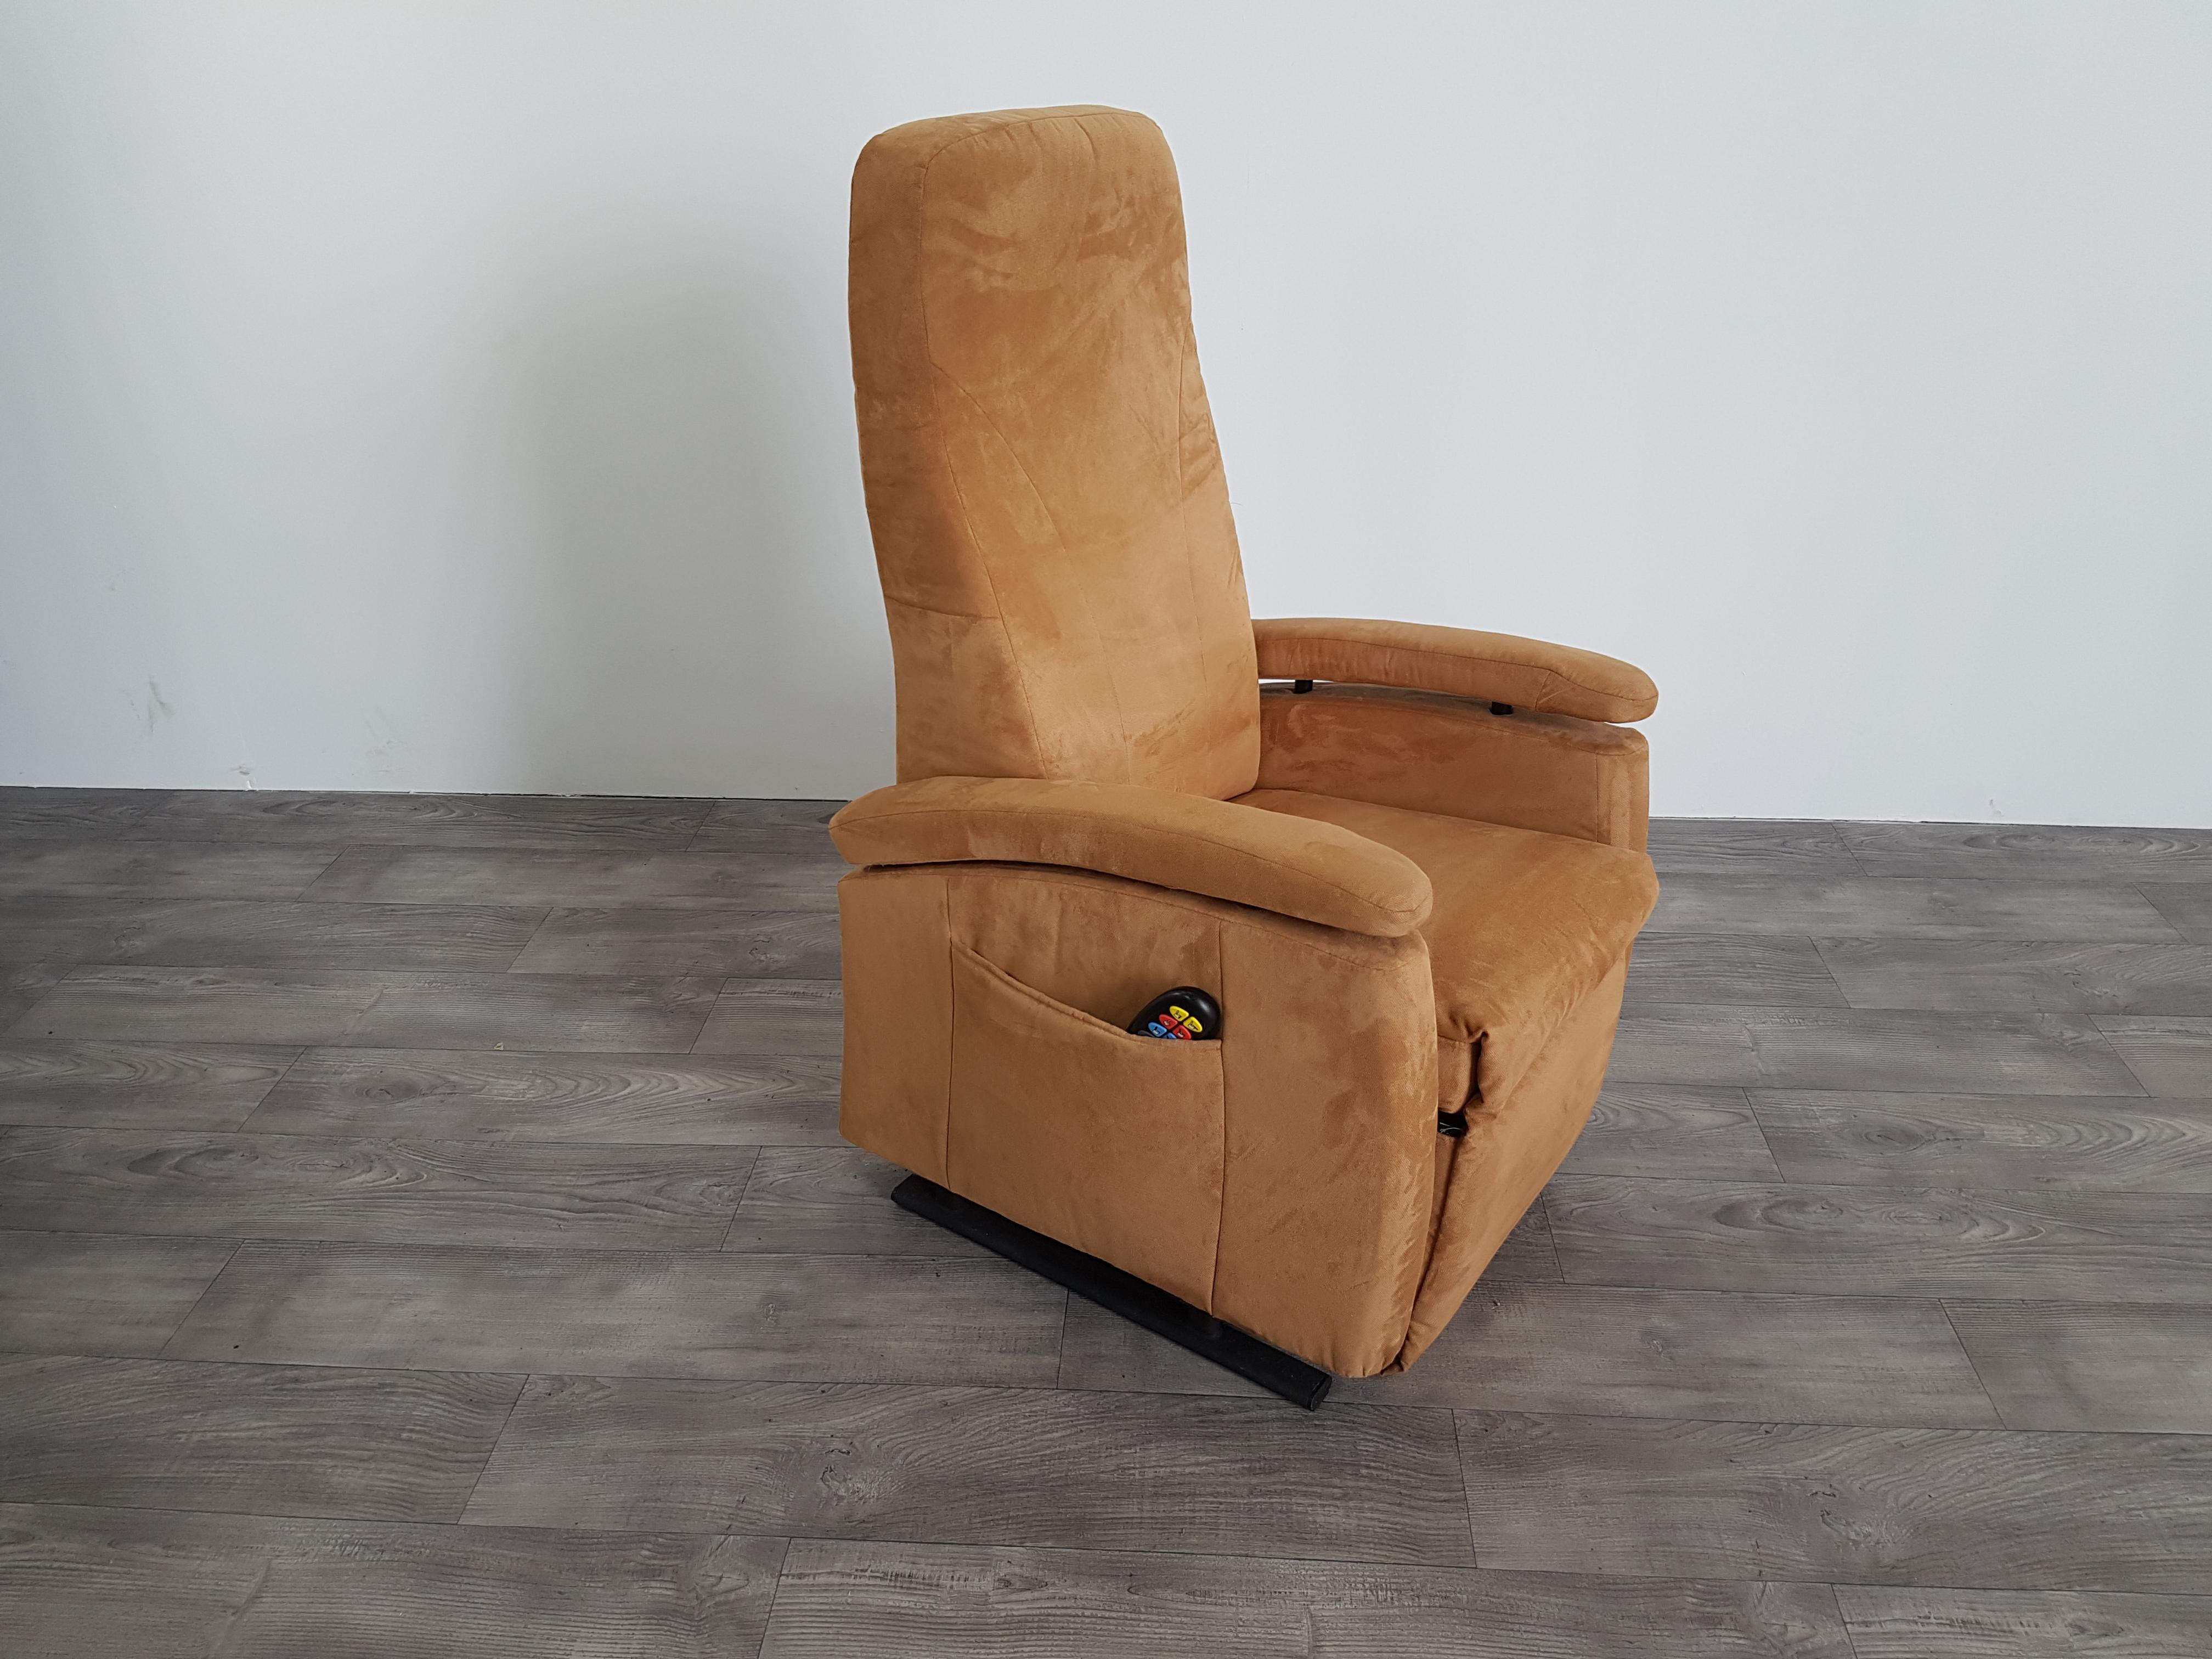 Sta Zit Stoel : Sta op stoel cm breed camel u ac per maand zeker